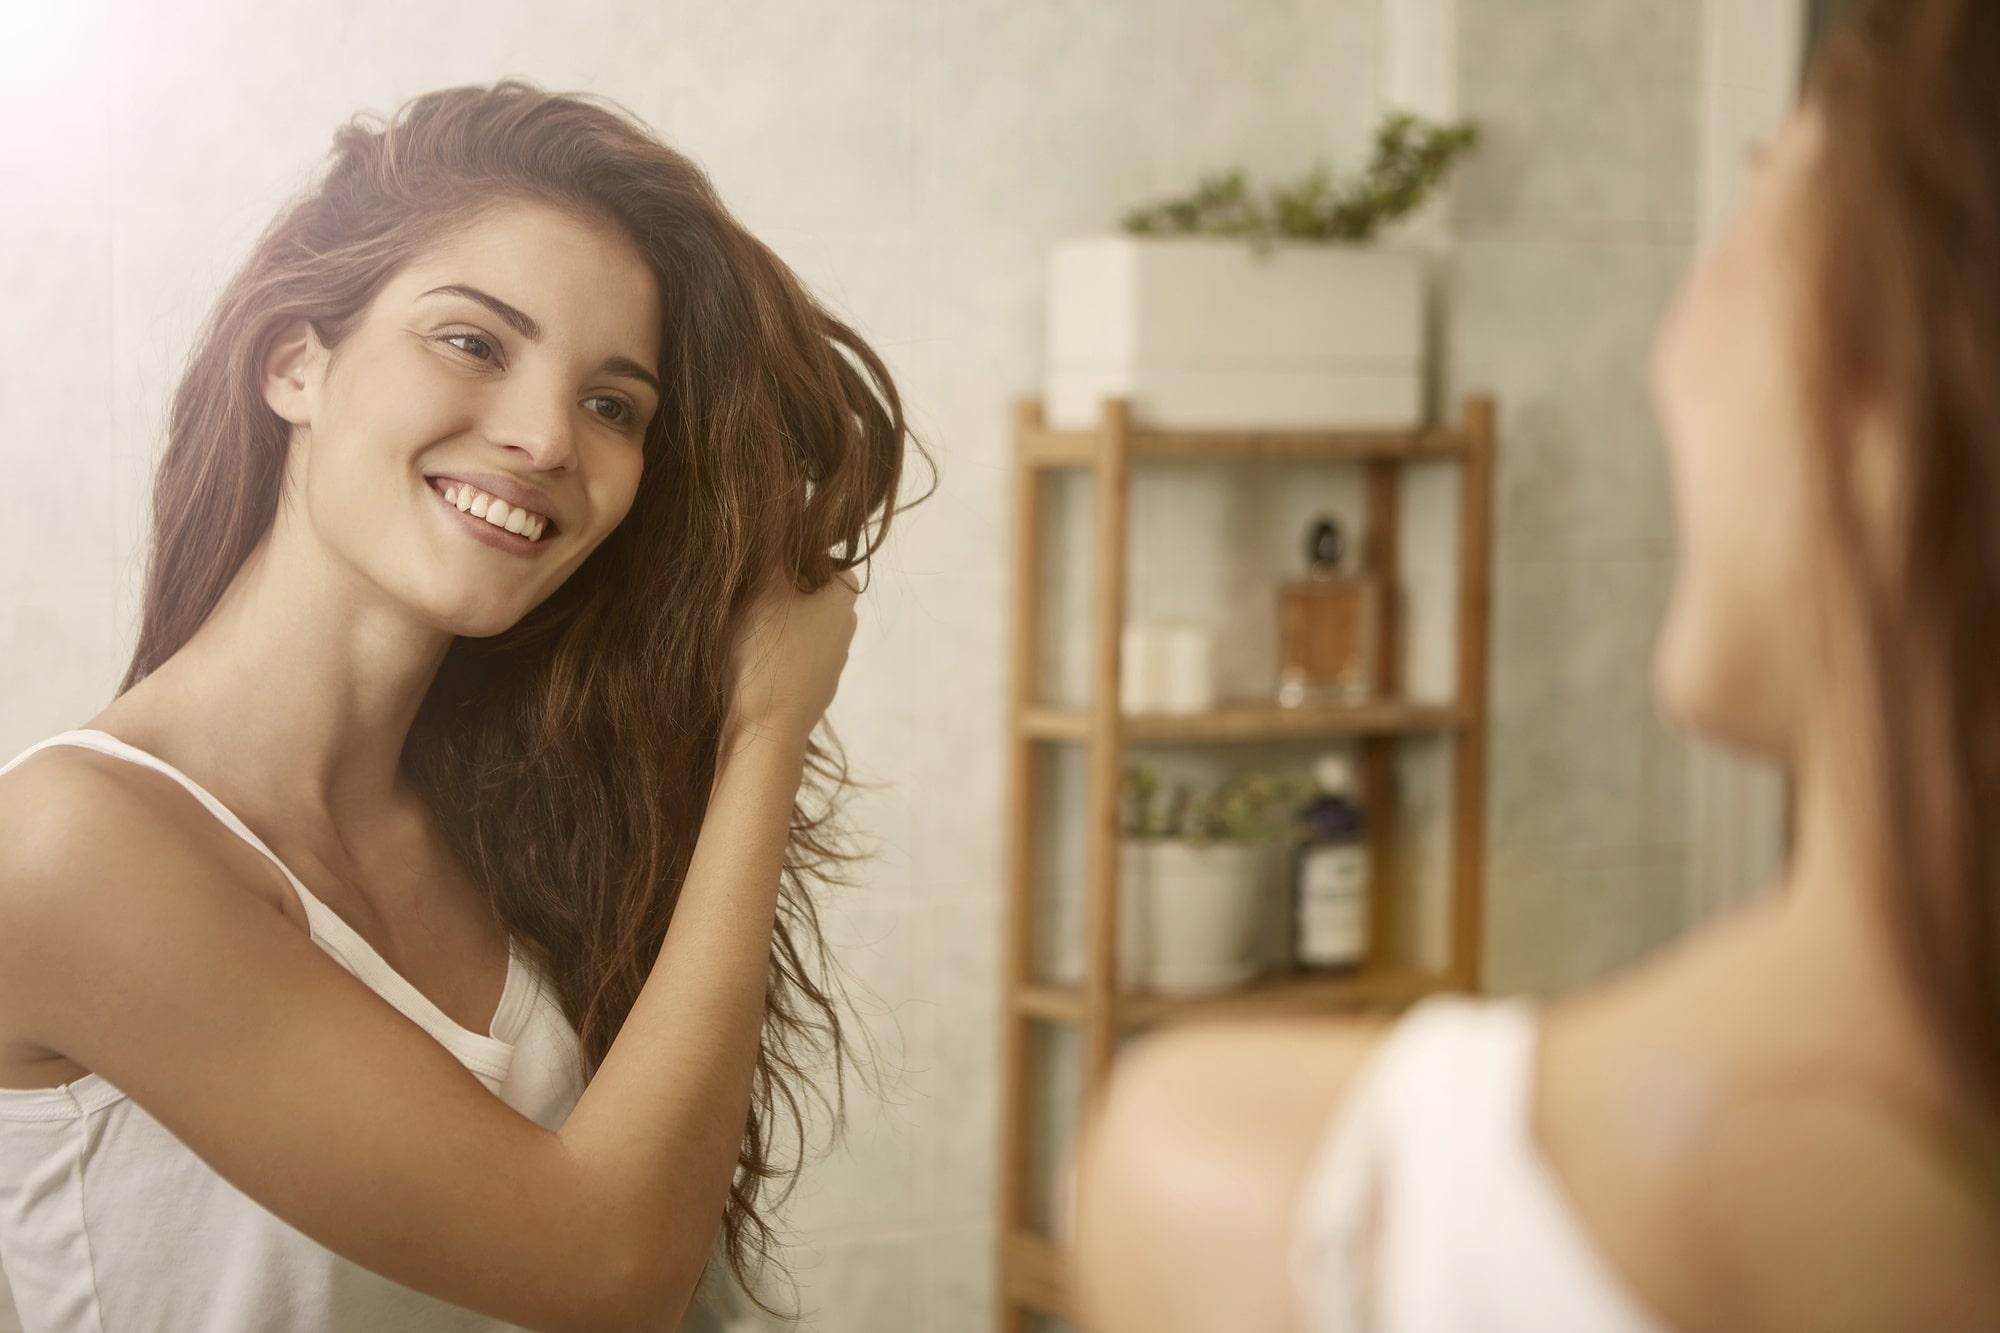 10 Common Hair Vitamin-Shopping Mistakes to Avoid Online